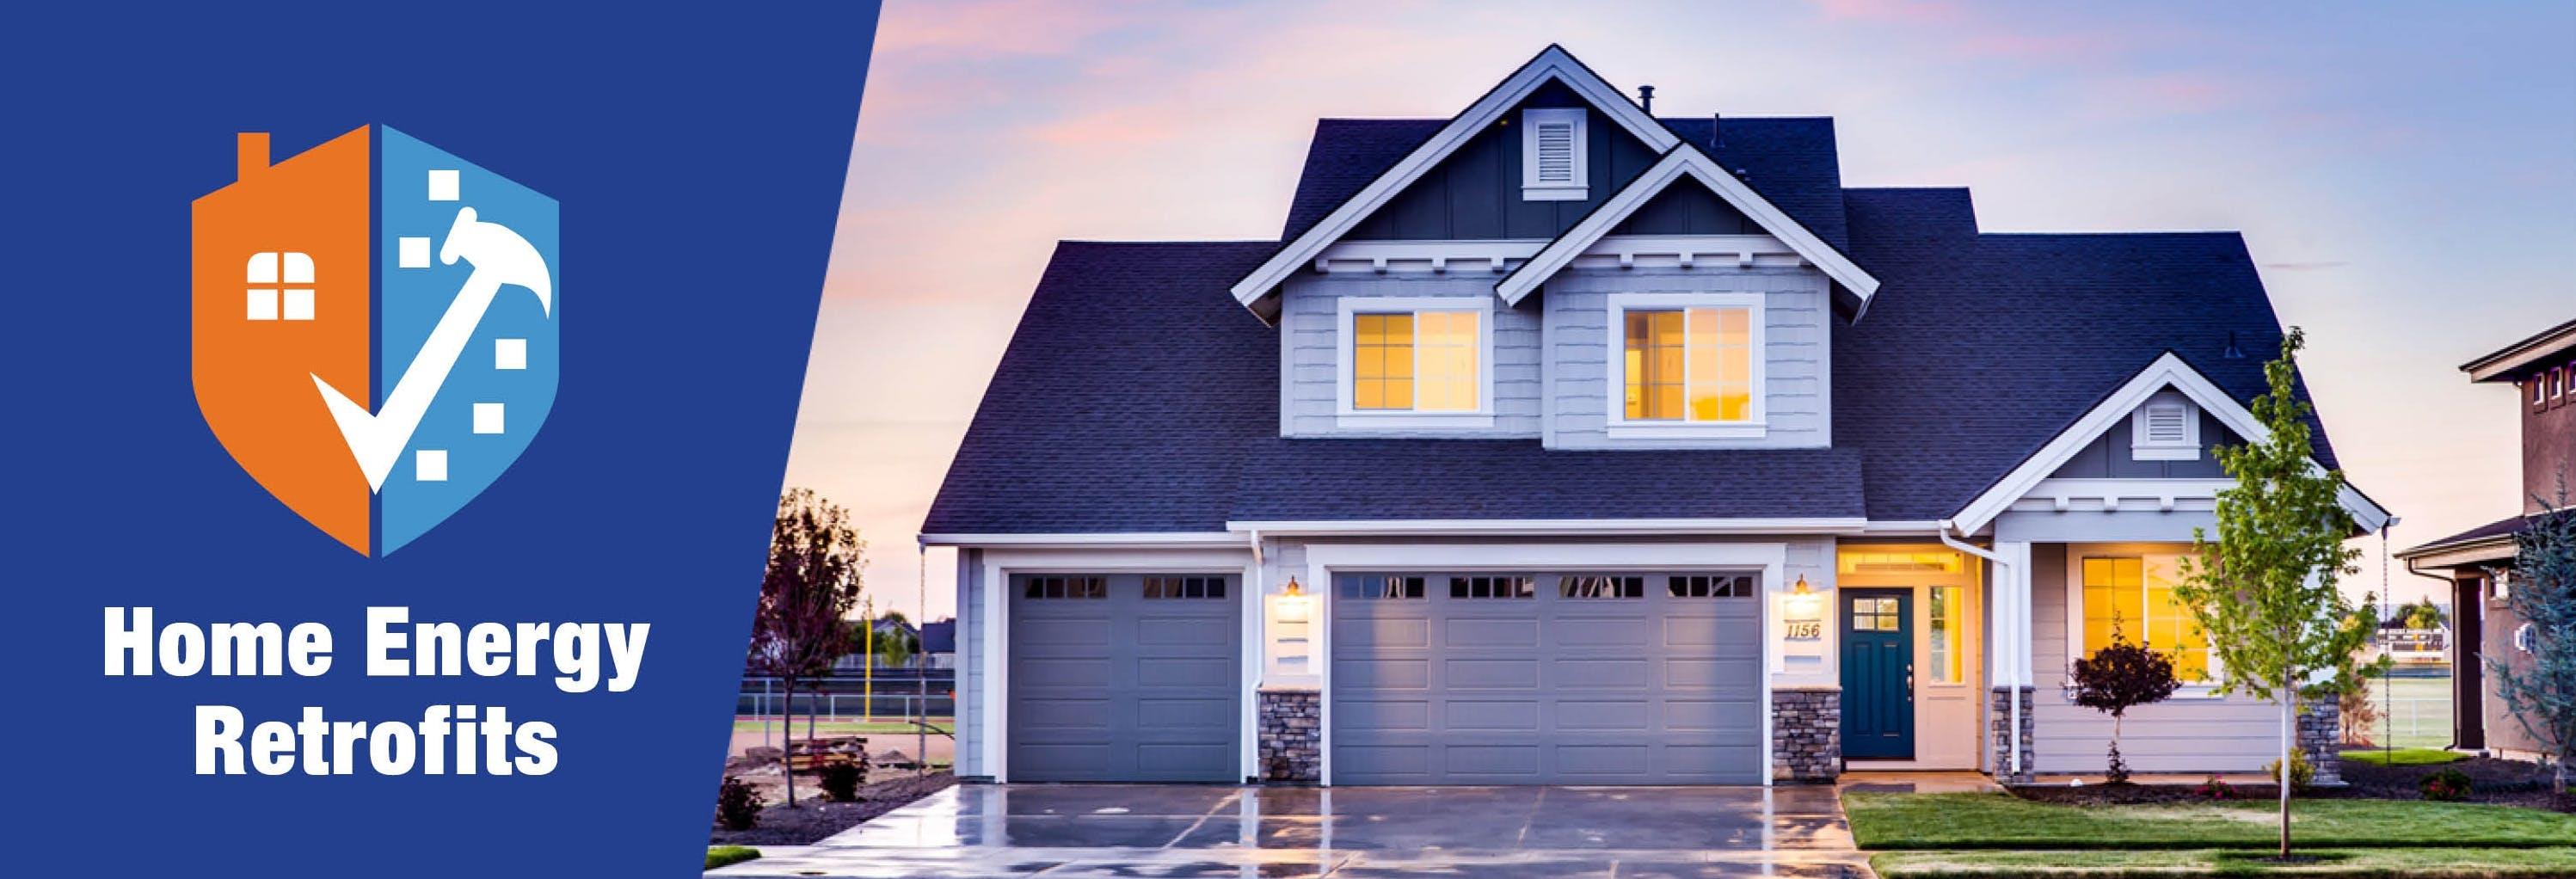 Home Energy Retrofits - Single detached home